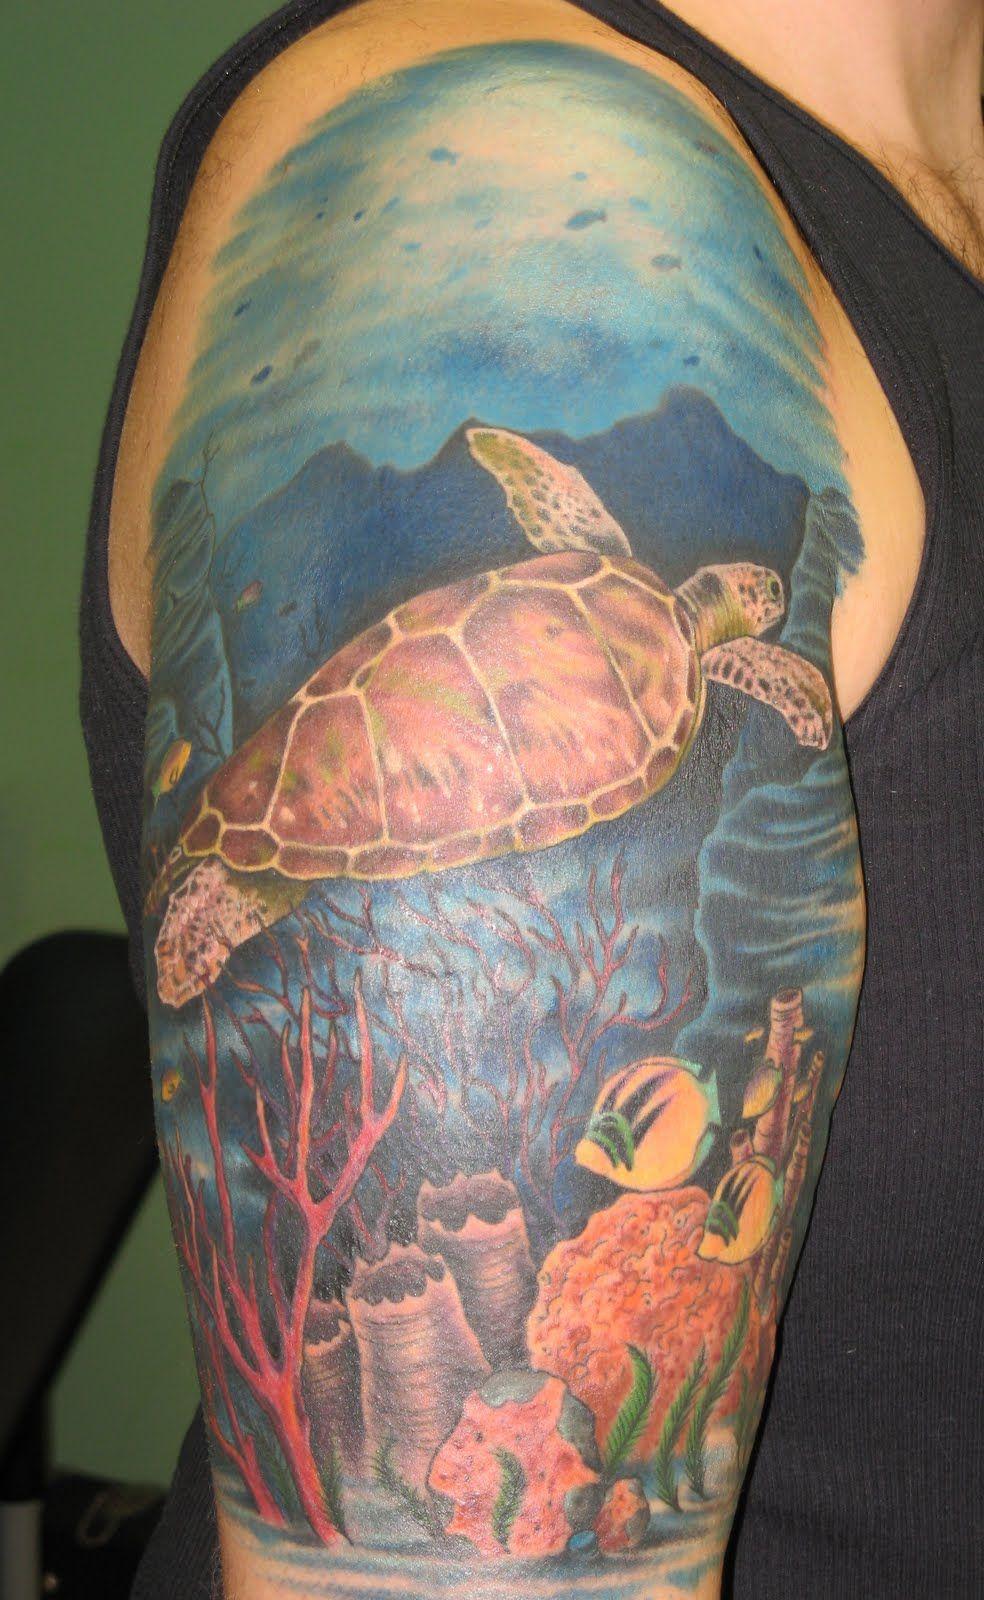 coral reef drawings for tattoos sea turtle ocean scene tattoo tattooideas pinterest. Black Bedroom Furniture Sets. Home Design Ideas